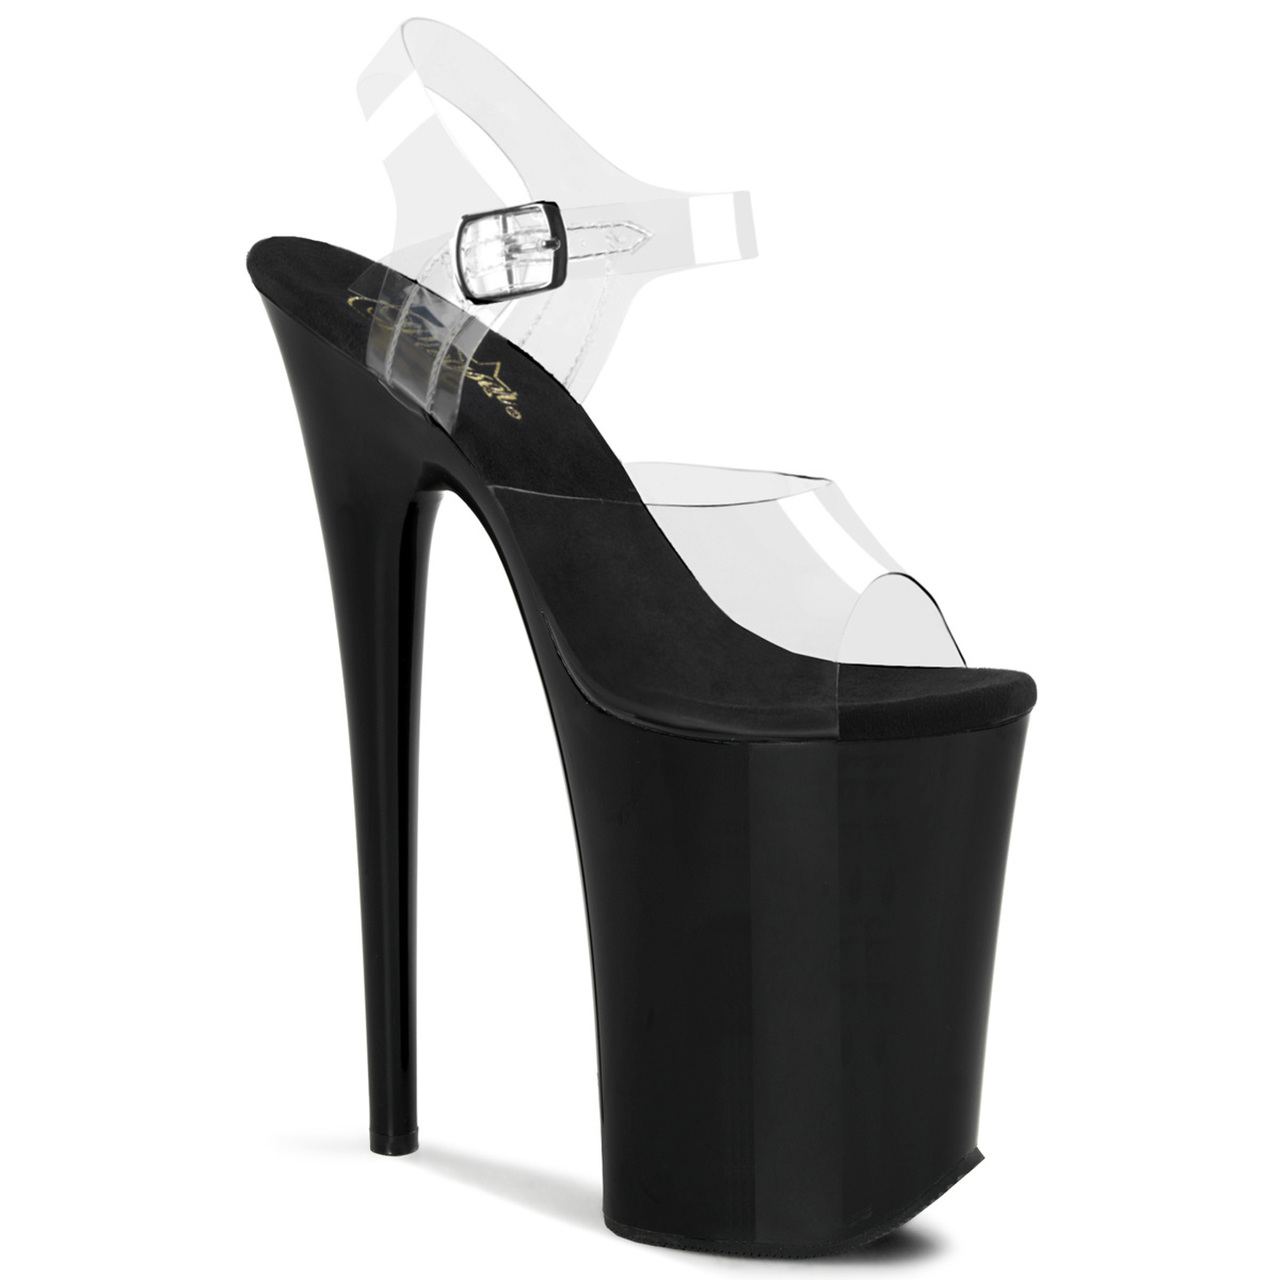 4 Inch Platform Heels